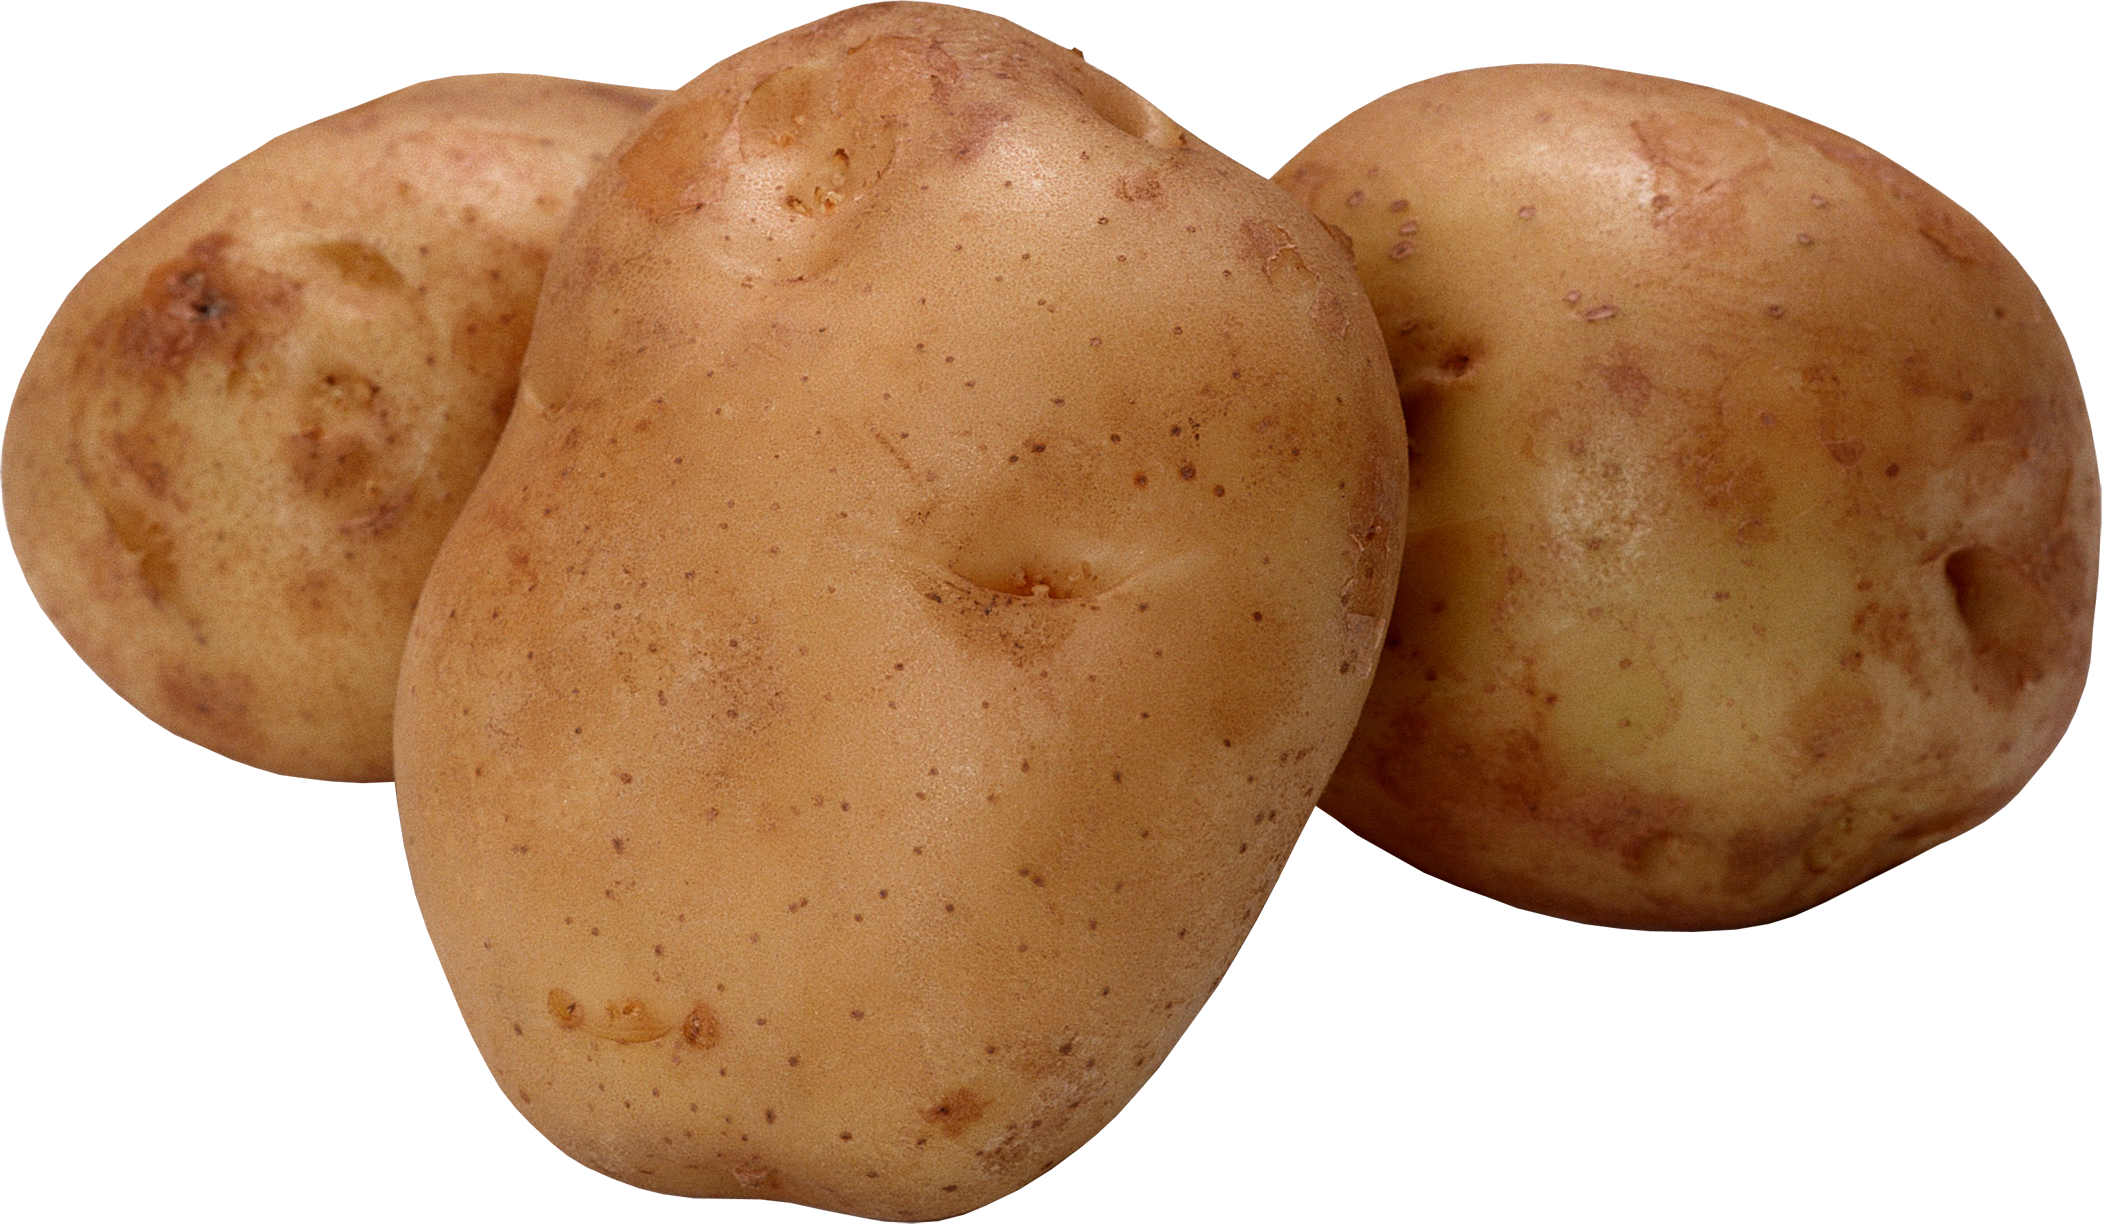 Potatoes PNG Image